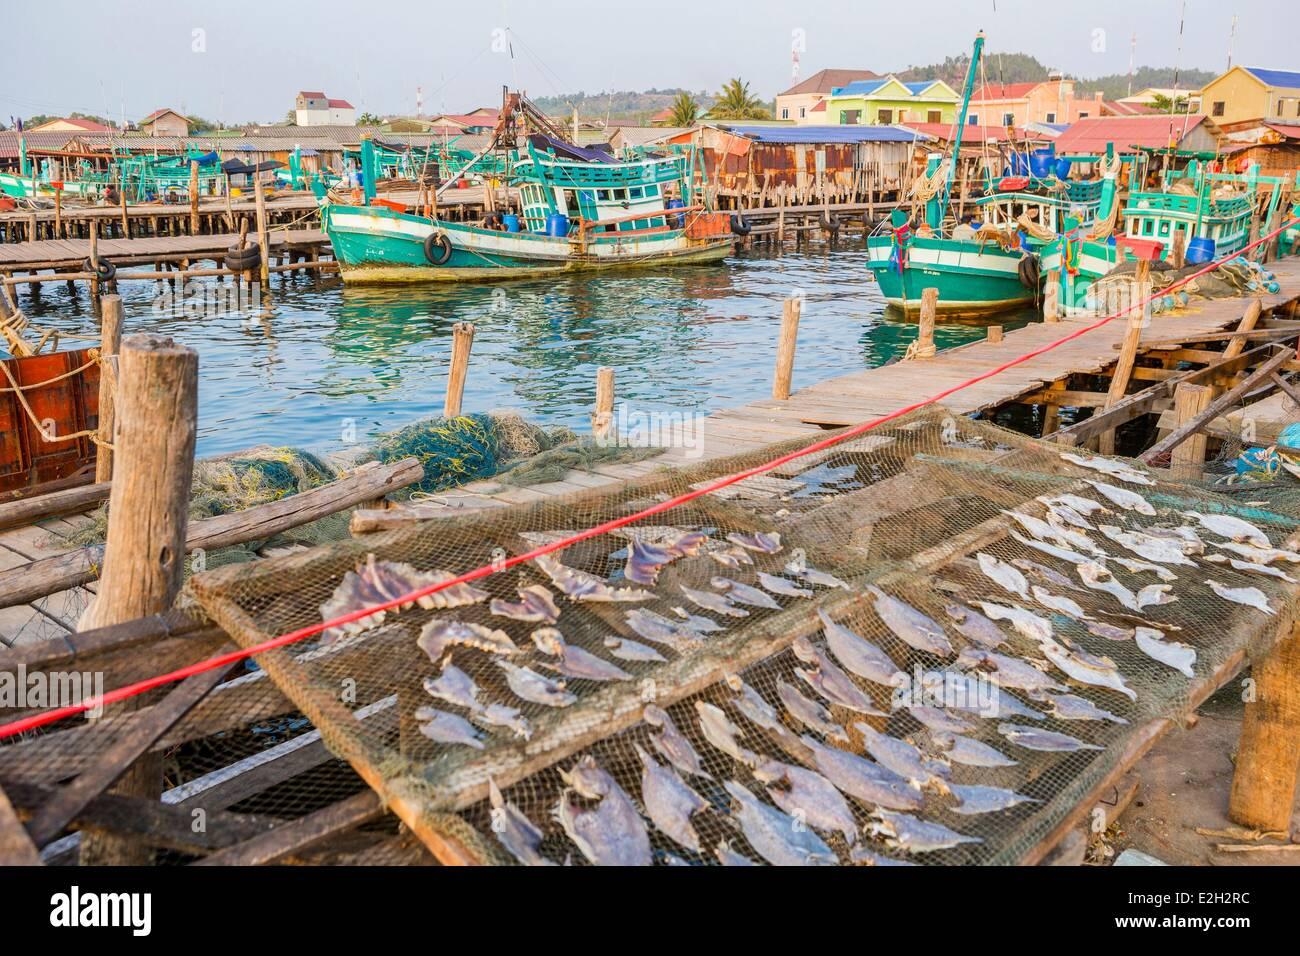 Cambodia South coast Kompong Song province Sihanoukville fishing port - Stock Image